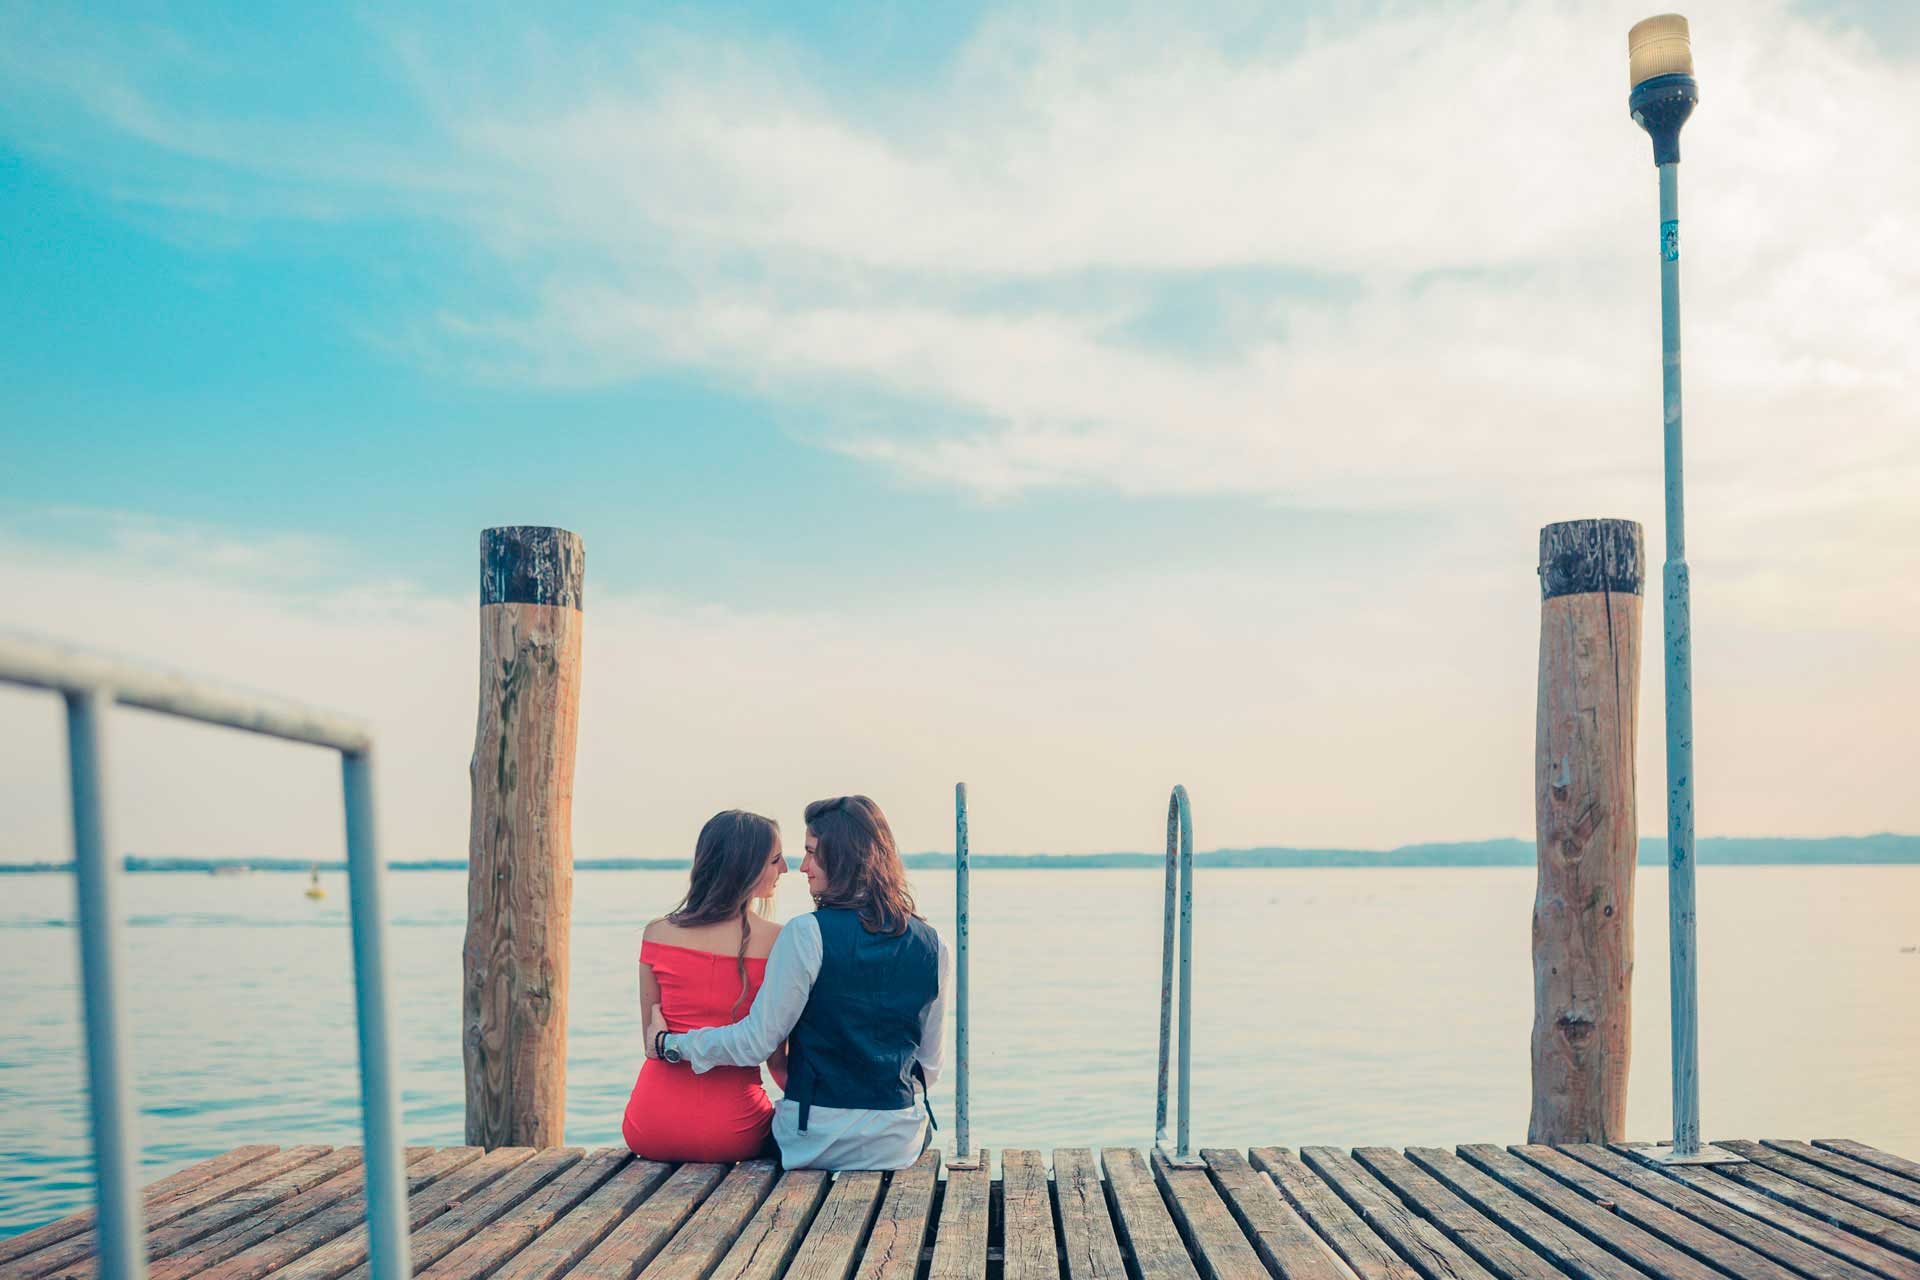 Lake Garda Wedding Photographer - Lazise Wedding Photographer Professional wedding photographer - servizi fotografici GLPSTUDIO FOTO VIDEO LAZISE CELL. 335 5234158